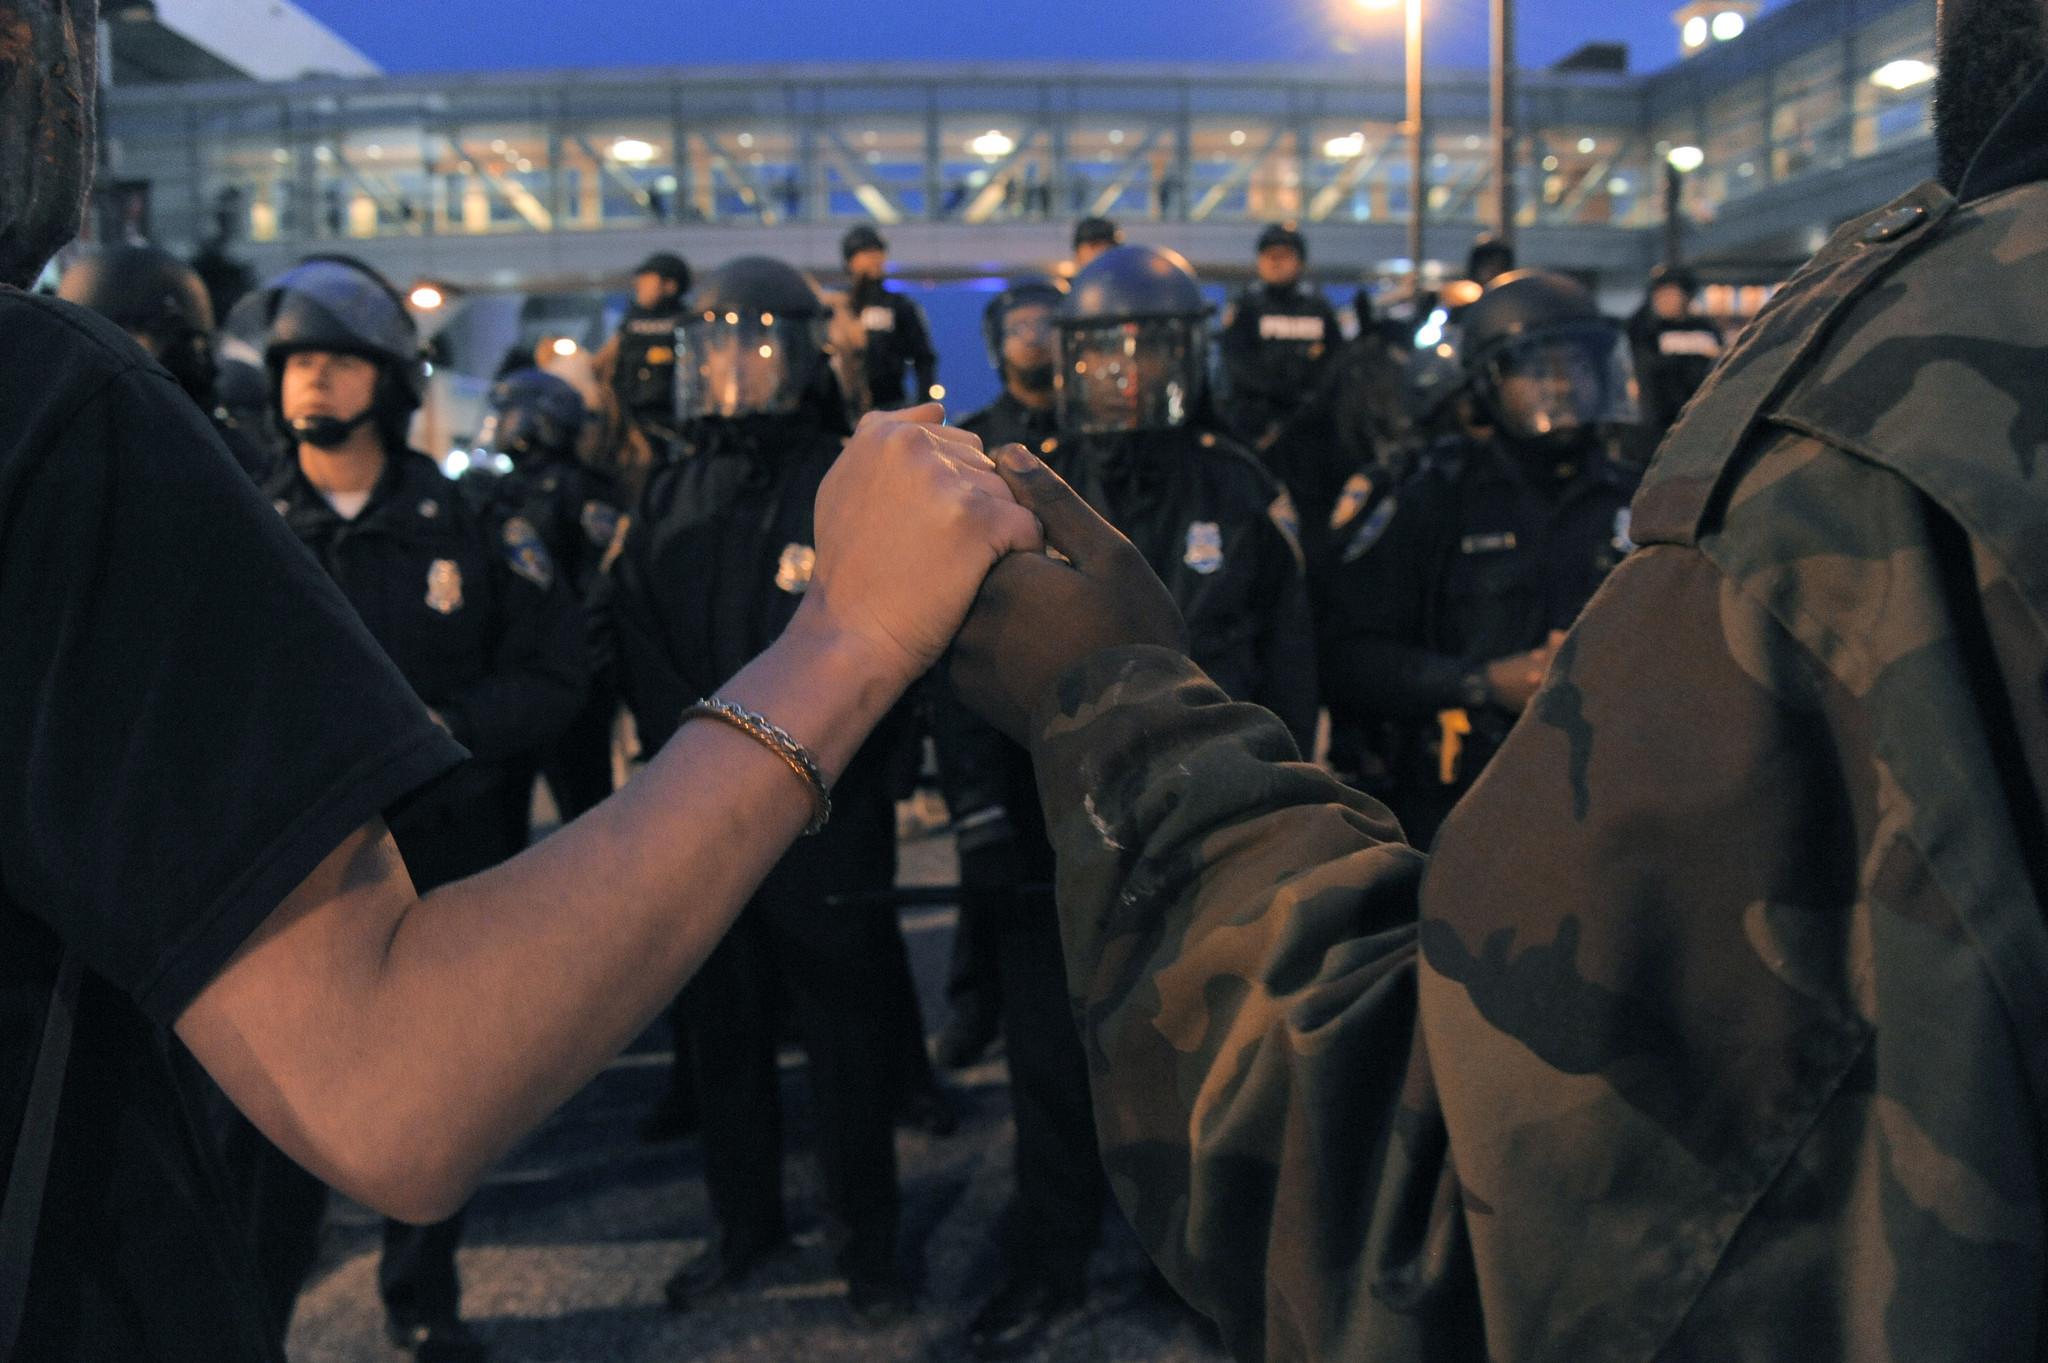 Baltimore police arrest 35, 6 officers injured in protest